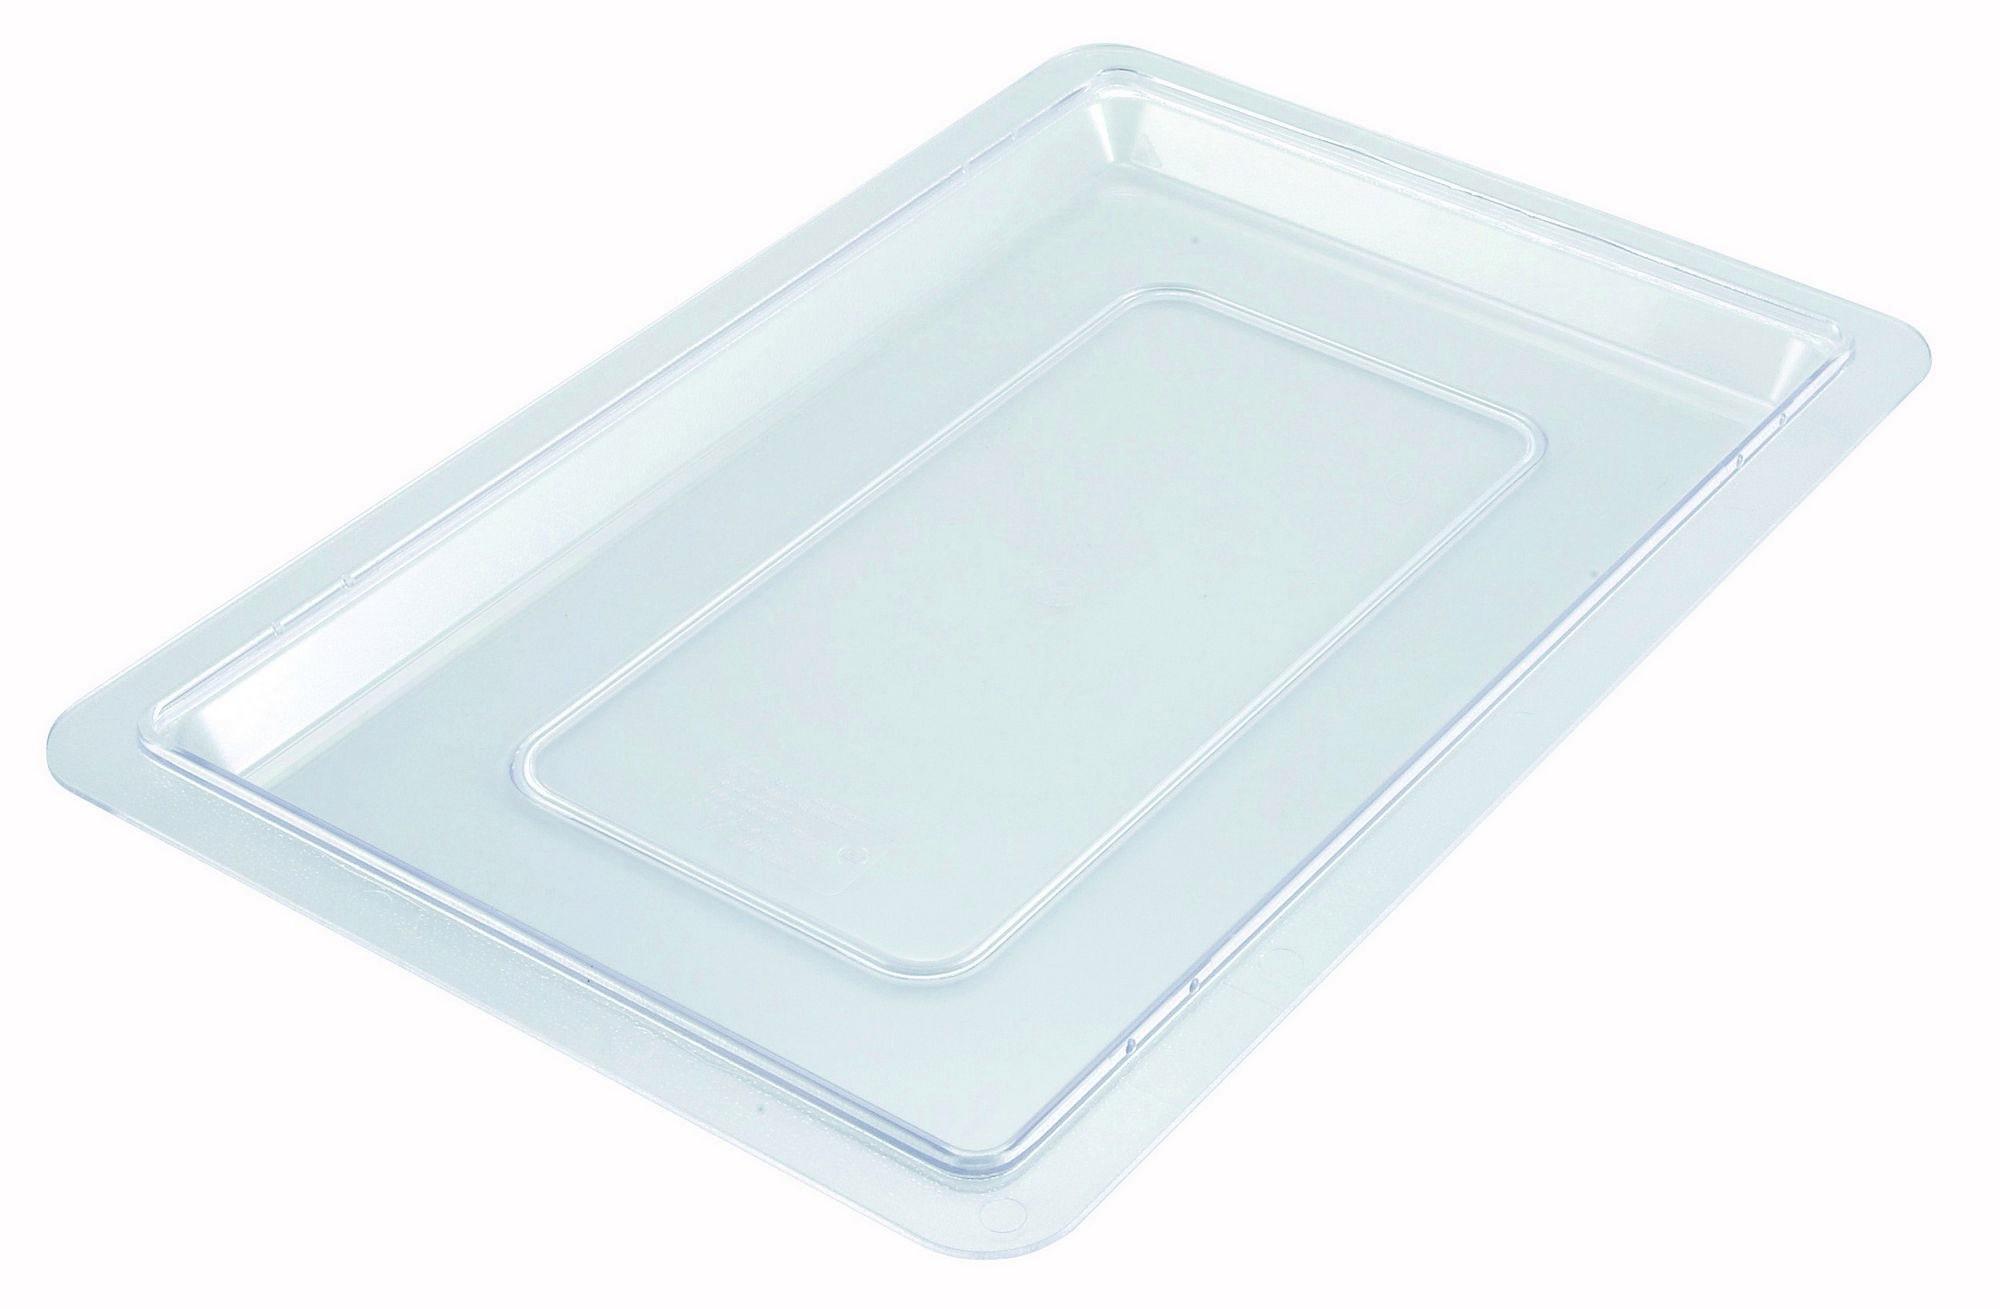 "Winco PFSH-C Polyware Cover for Food Storage Box 12"" x 18"""